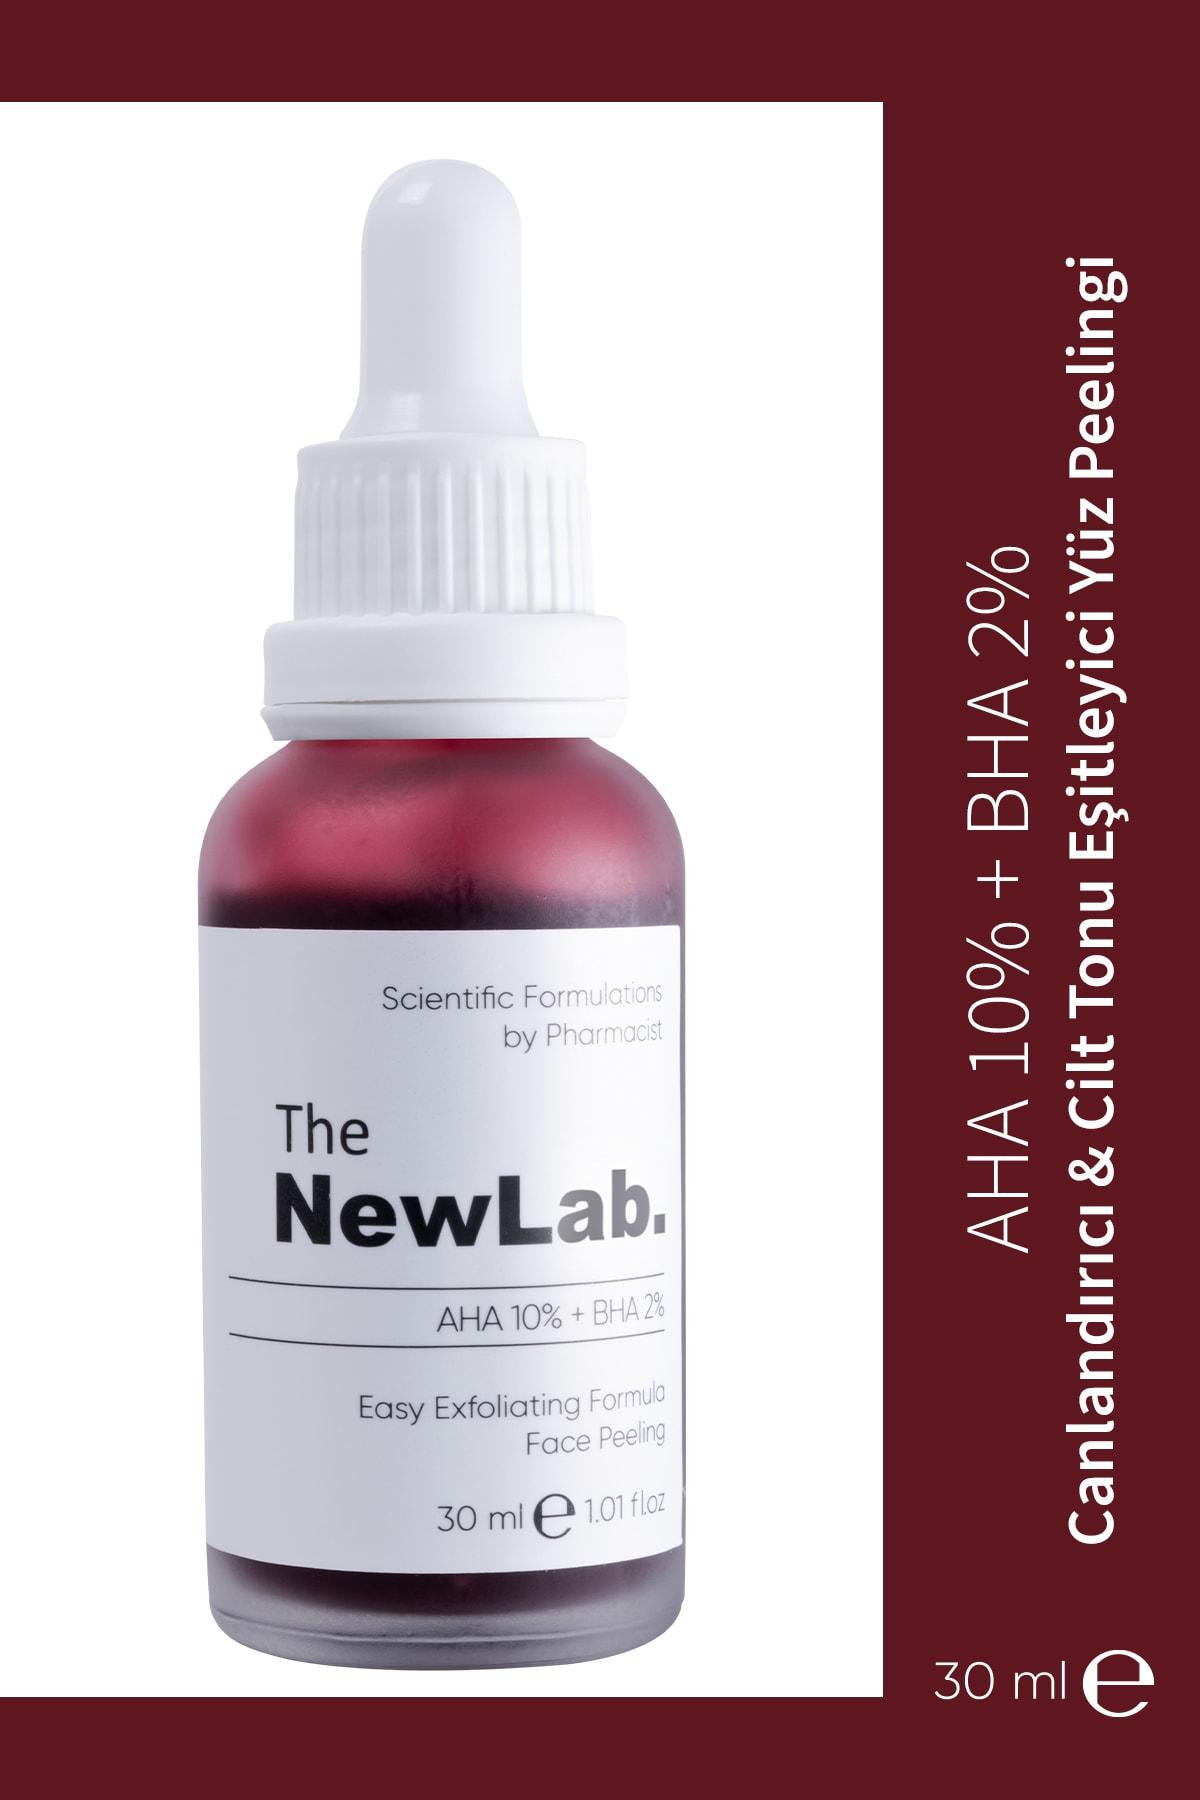 The NewLab Canlandırıcı & Cilt Tonu Eşitleyici Yüz Peeling Serum 30 Ml (aha 10% + Bha 2%) 1